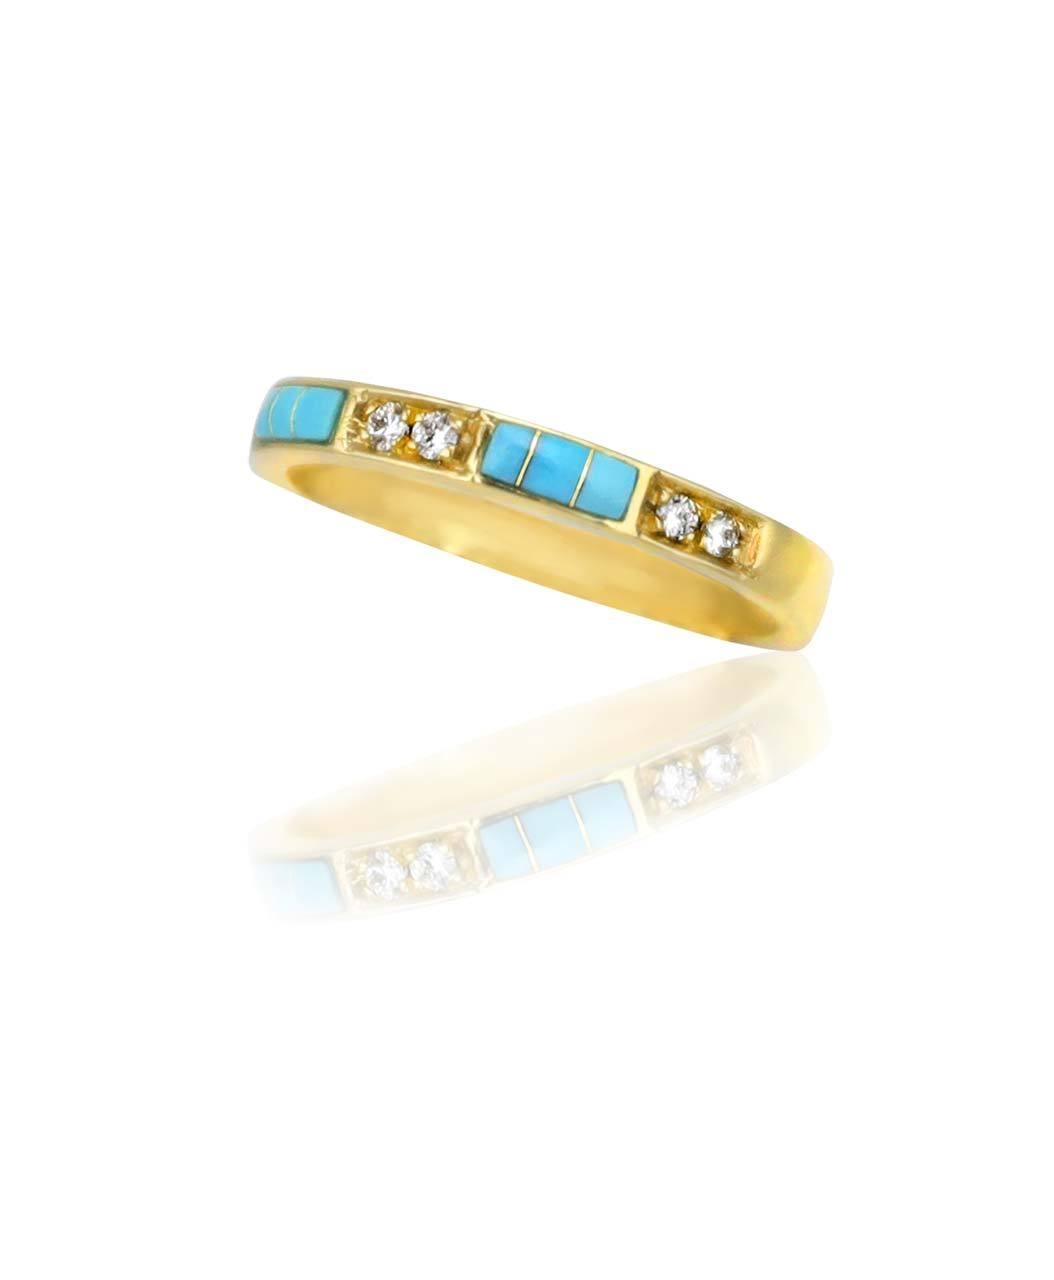 Maverick's 14K Gold Band Turquoise Inlay And Diamonds